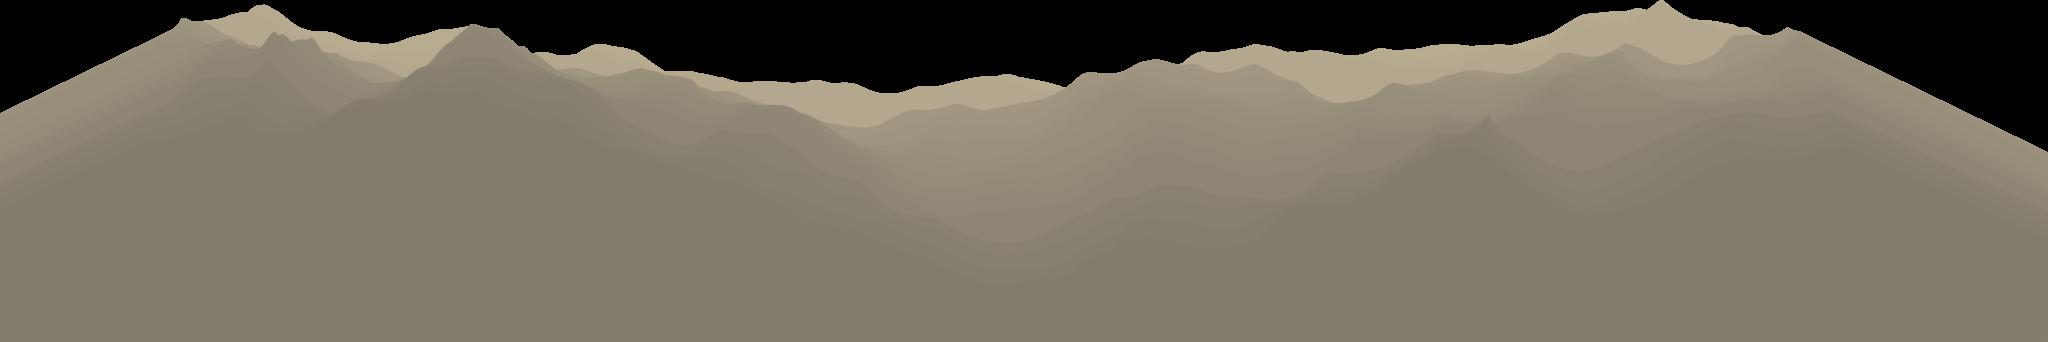 Gingiskhan Gebirge